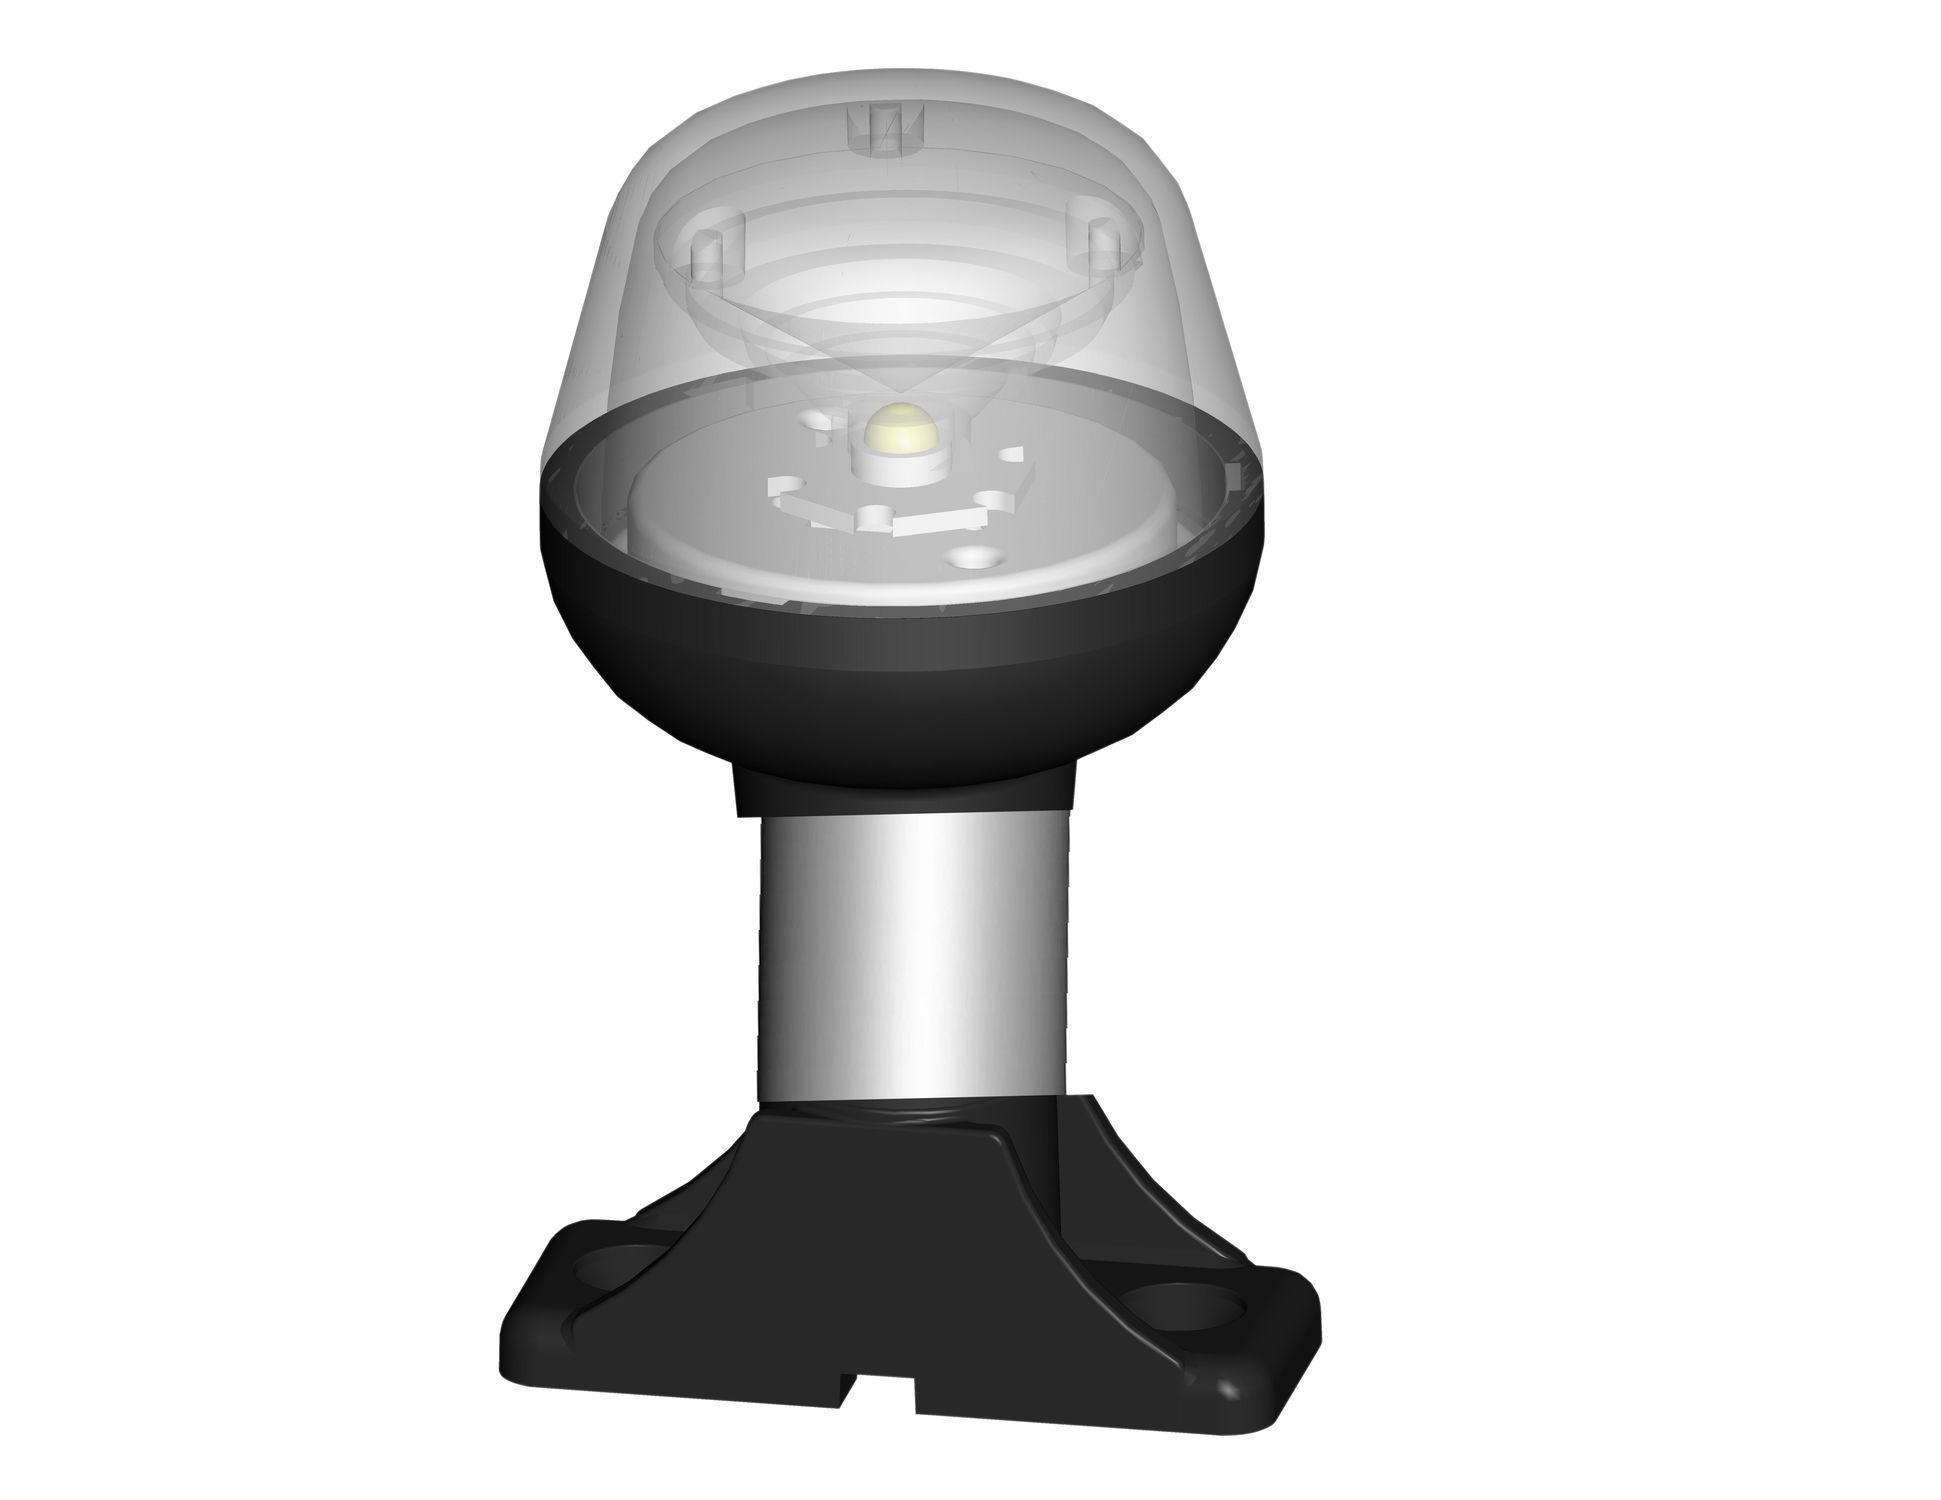 Plafoniere Per Nautica : Lampade a led volt per barche: luci di navigazione evoled eye